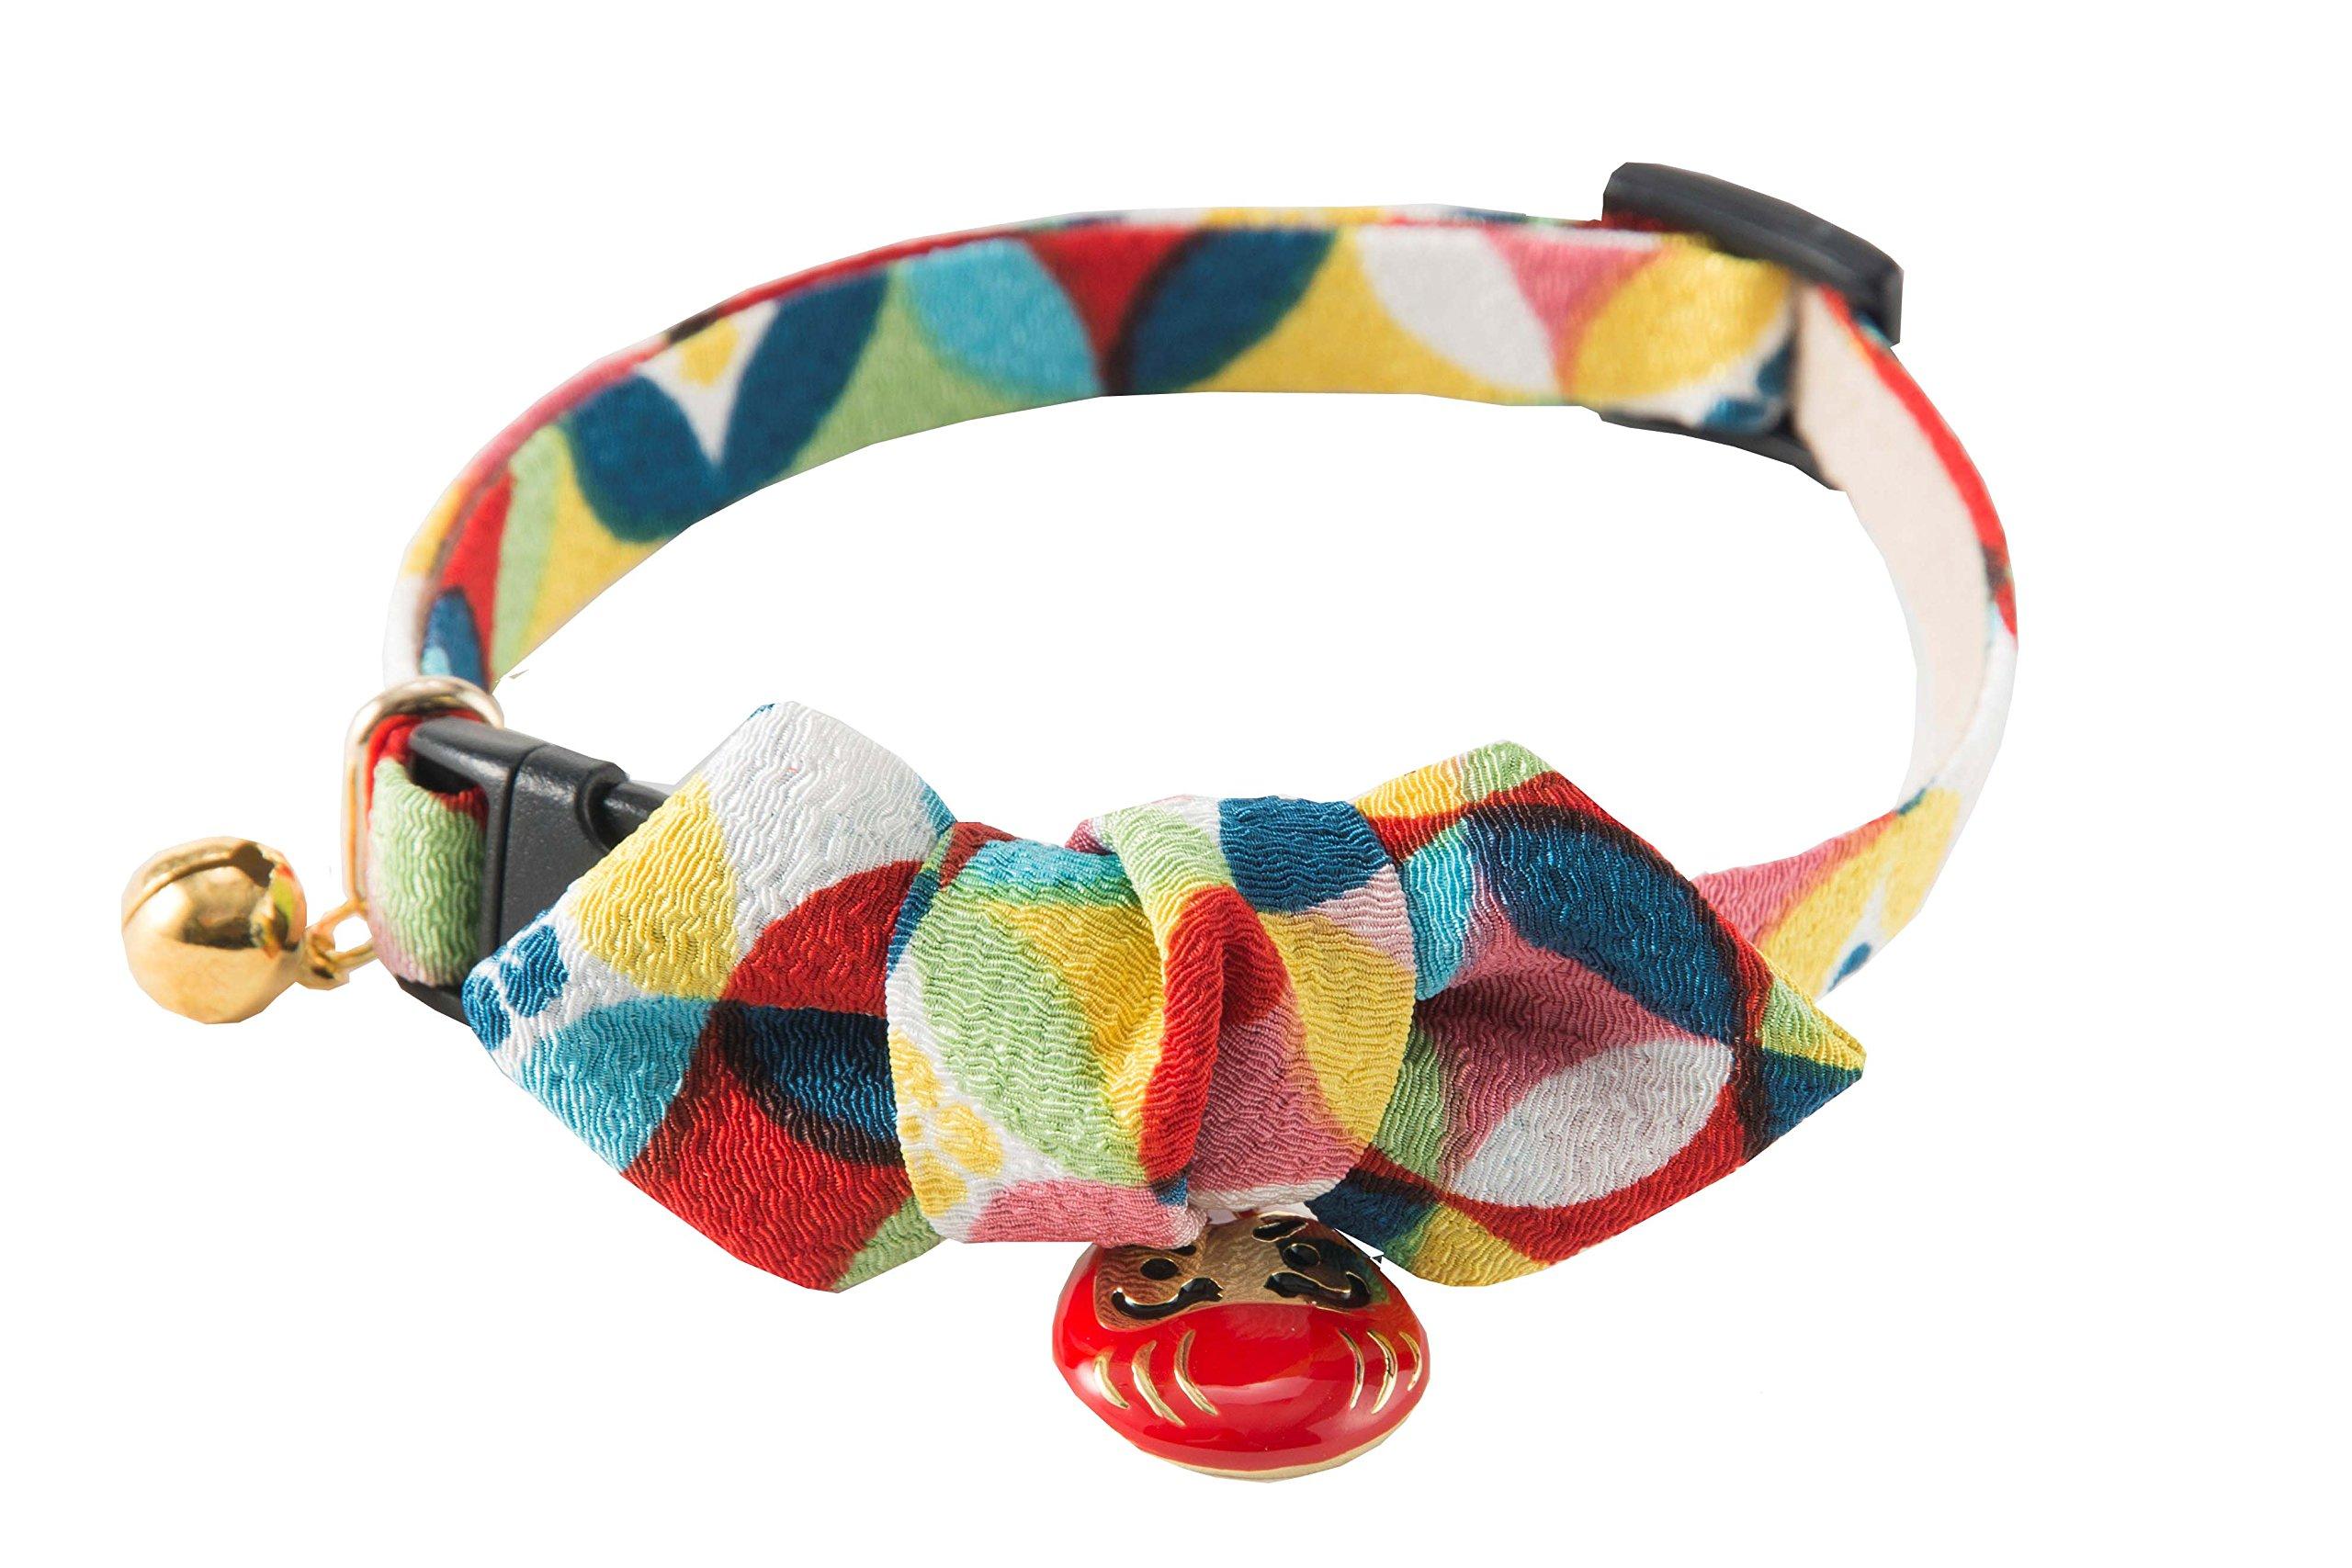 Necoichi Daruma Charm Bow Tie Cat Collar (Red)